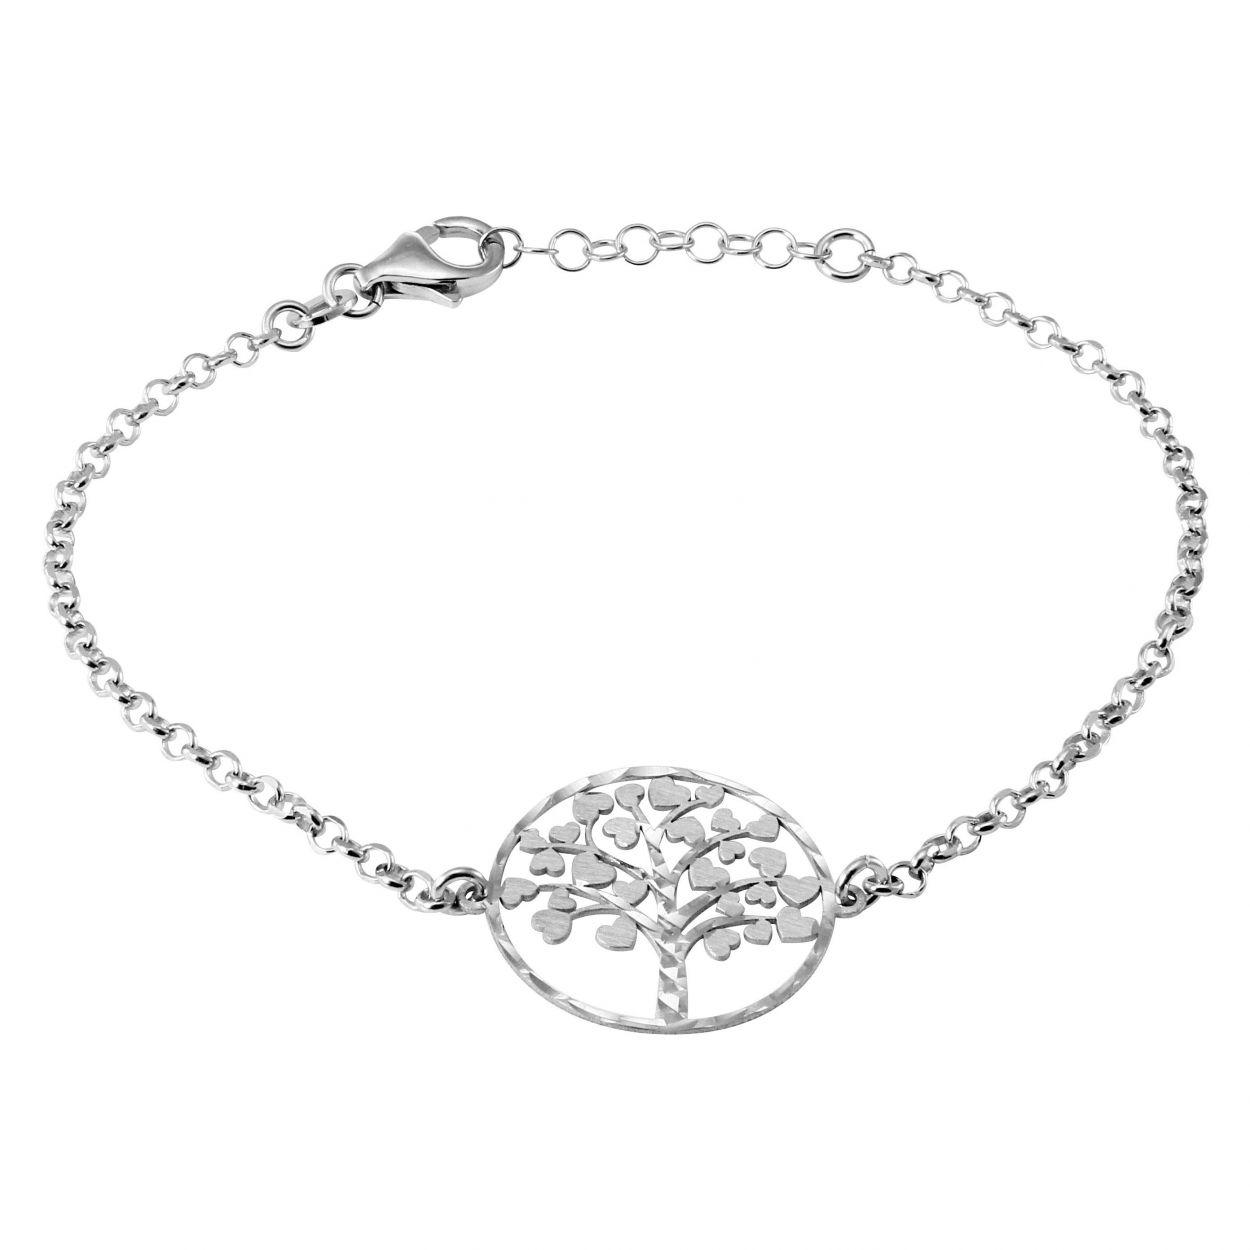 bracelet femme argent rhodie